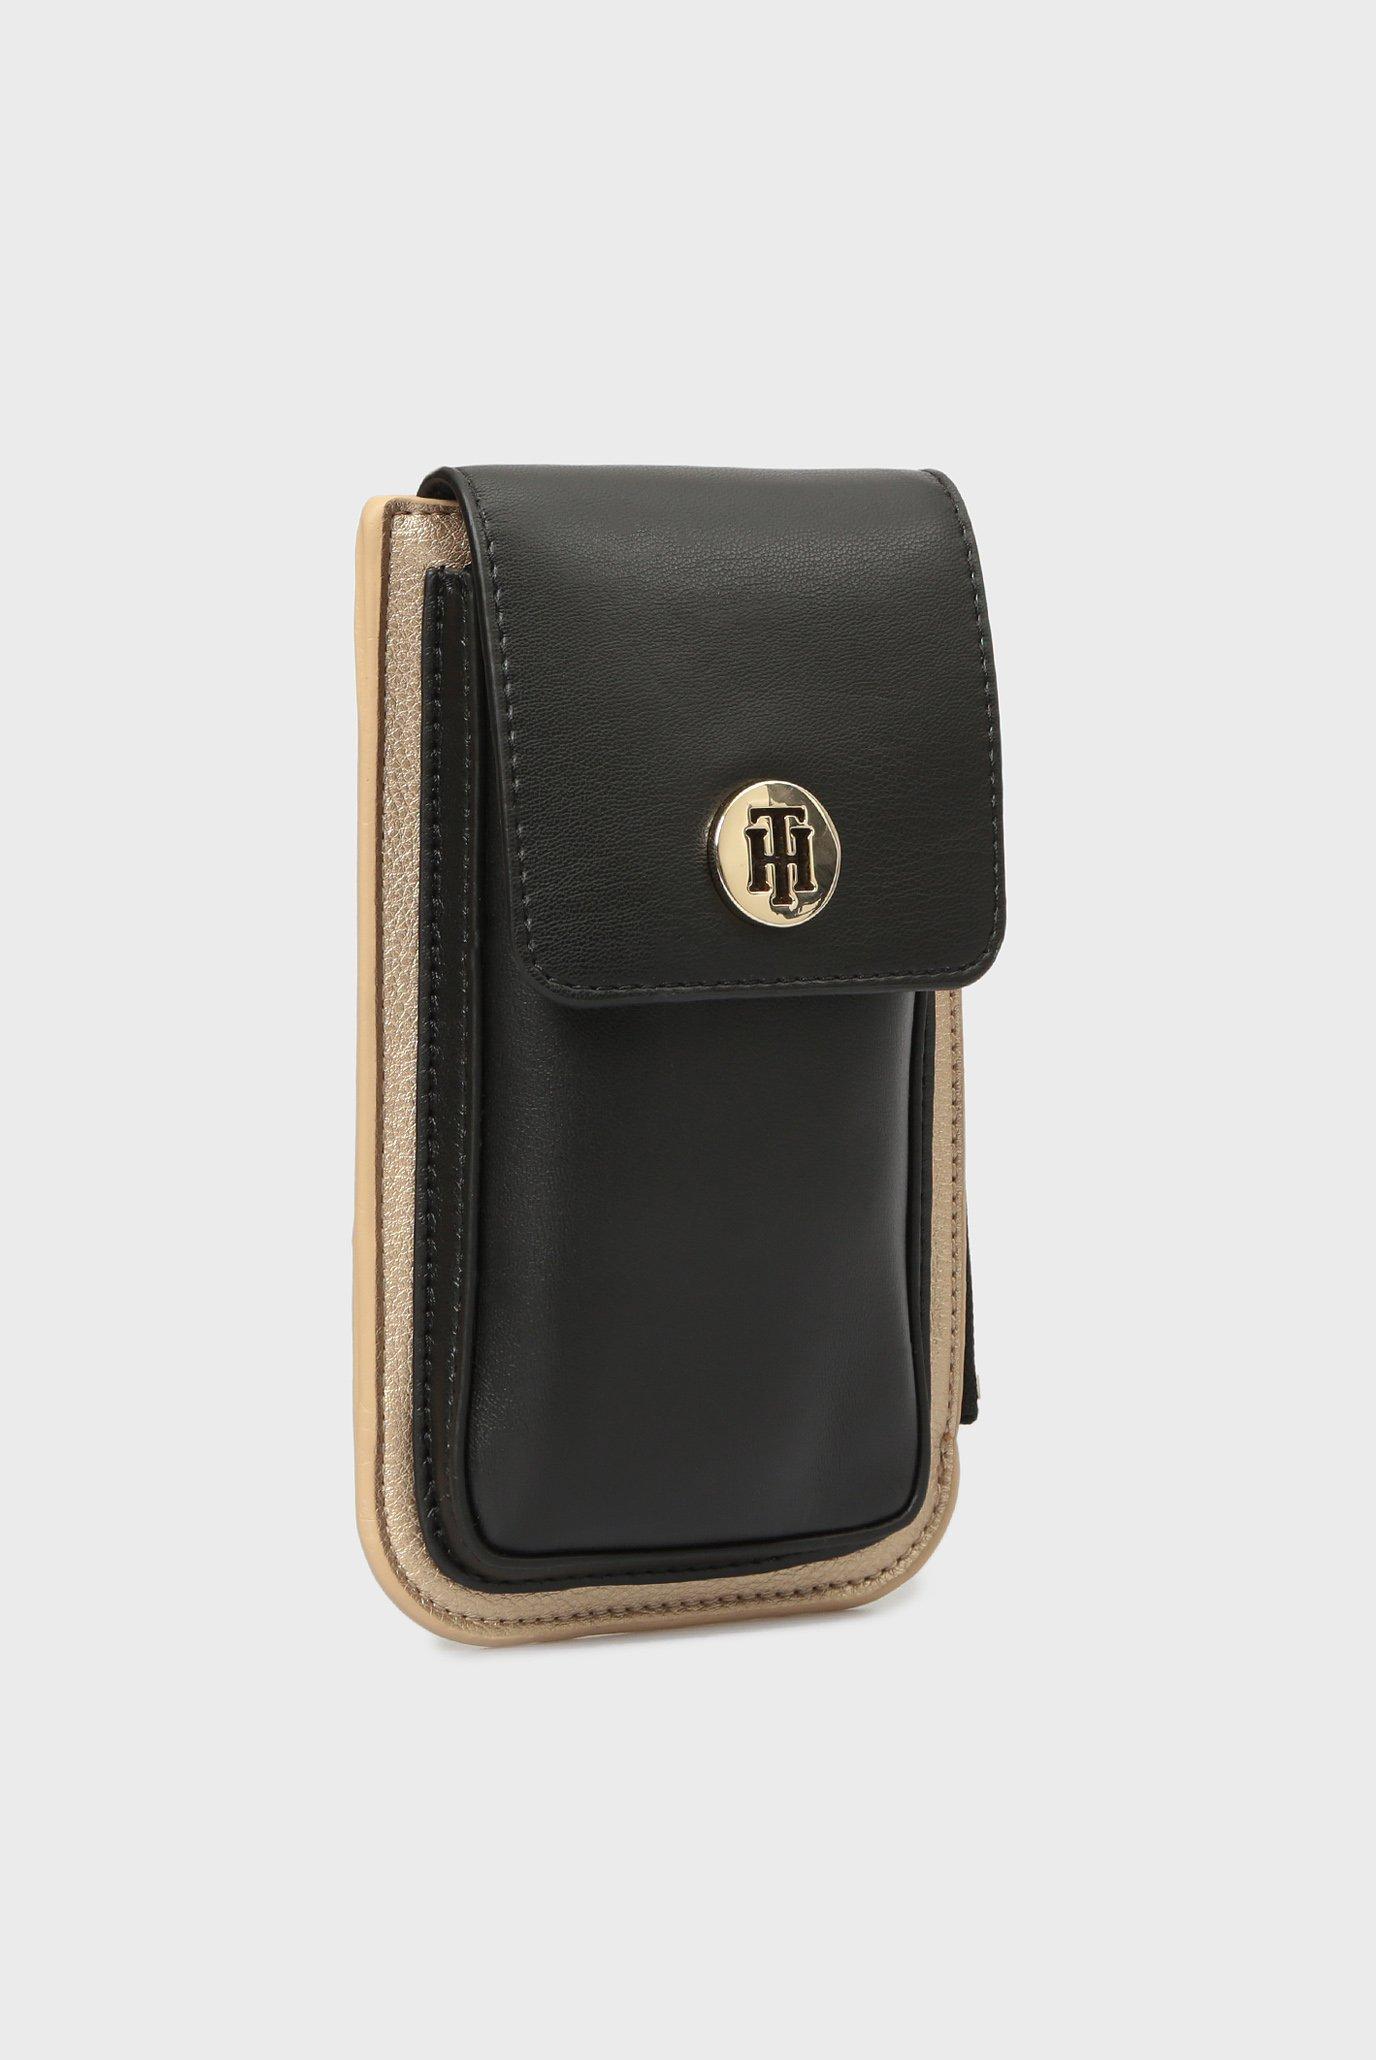 Купить Женская сумка-чехол для телефона IDENTITY PHONE POUCH Tommy Hilfiger Tommy Hilfiger AW0AW05808 – Киев, Украина. Цены в интернет магазине MD Fashion